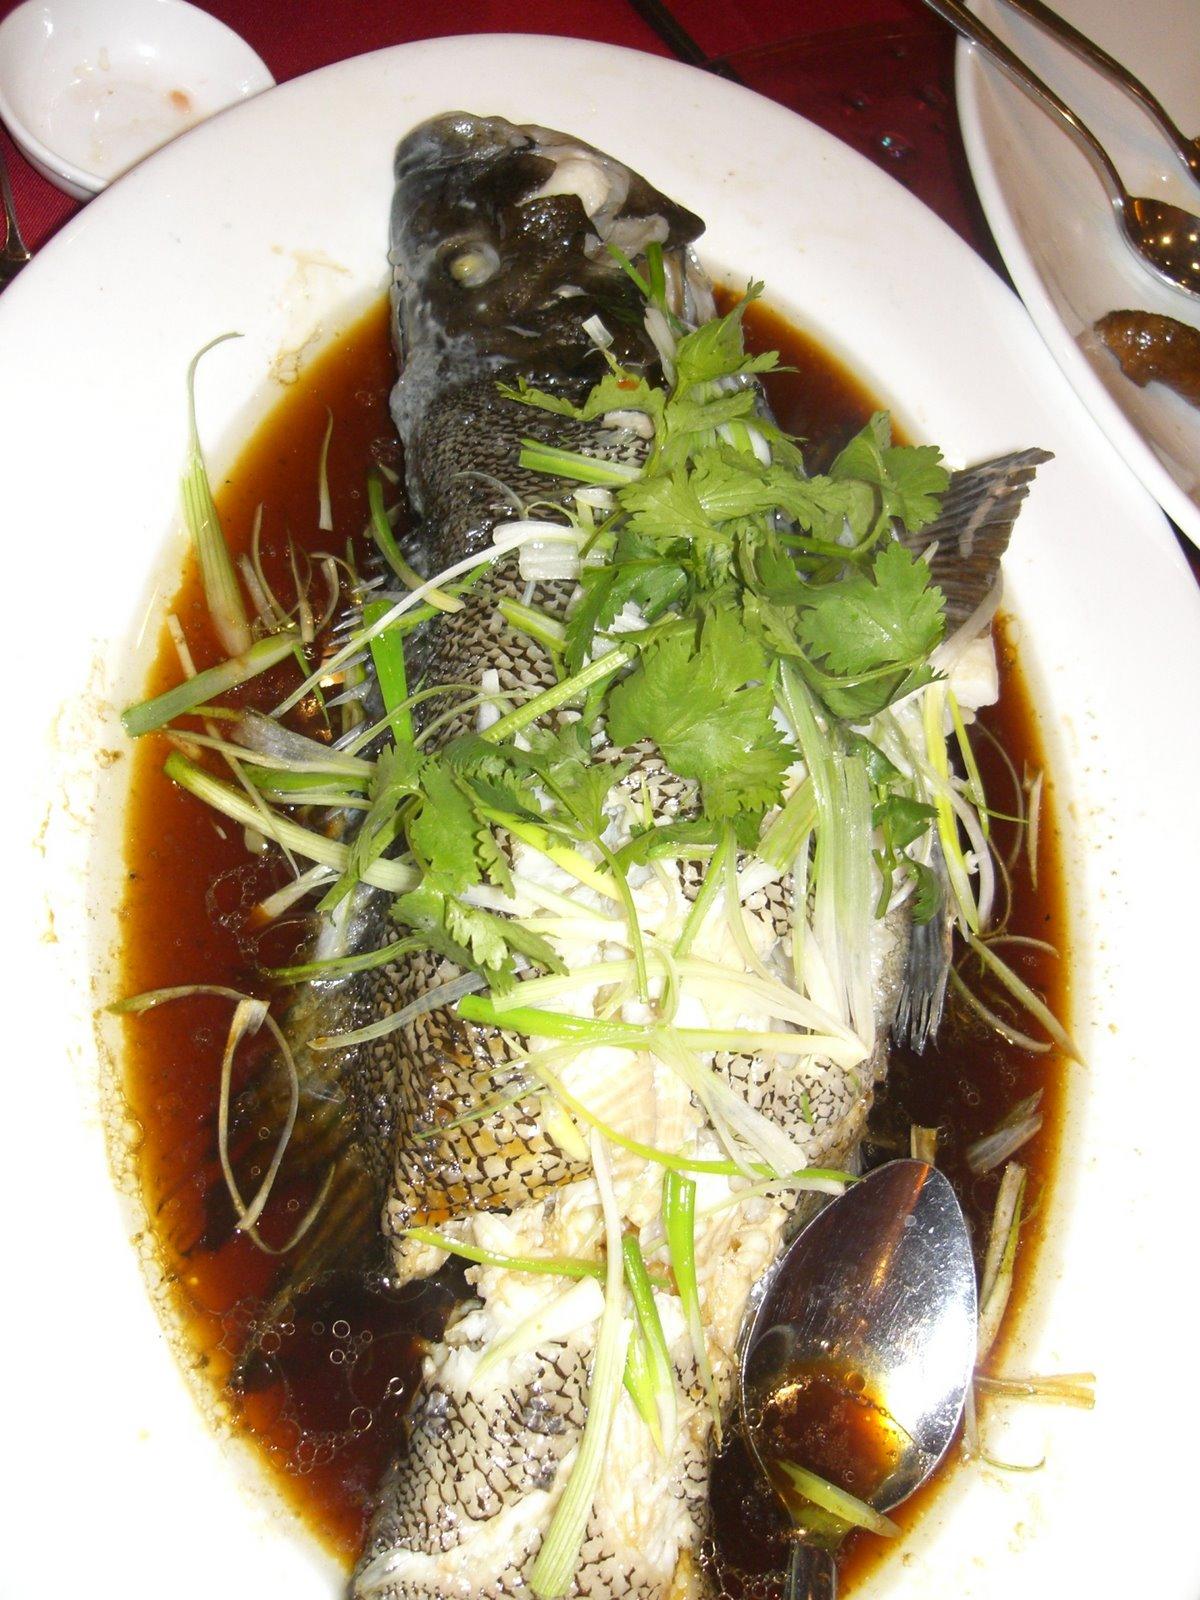 East ocean palace banquet stylin foodmayhem for Steamed whole fish